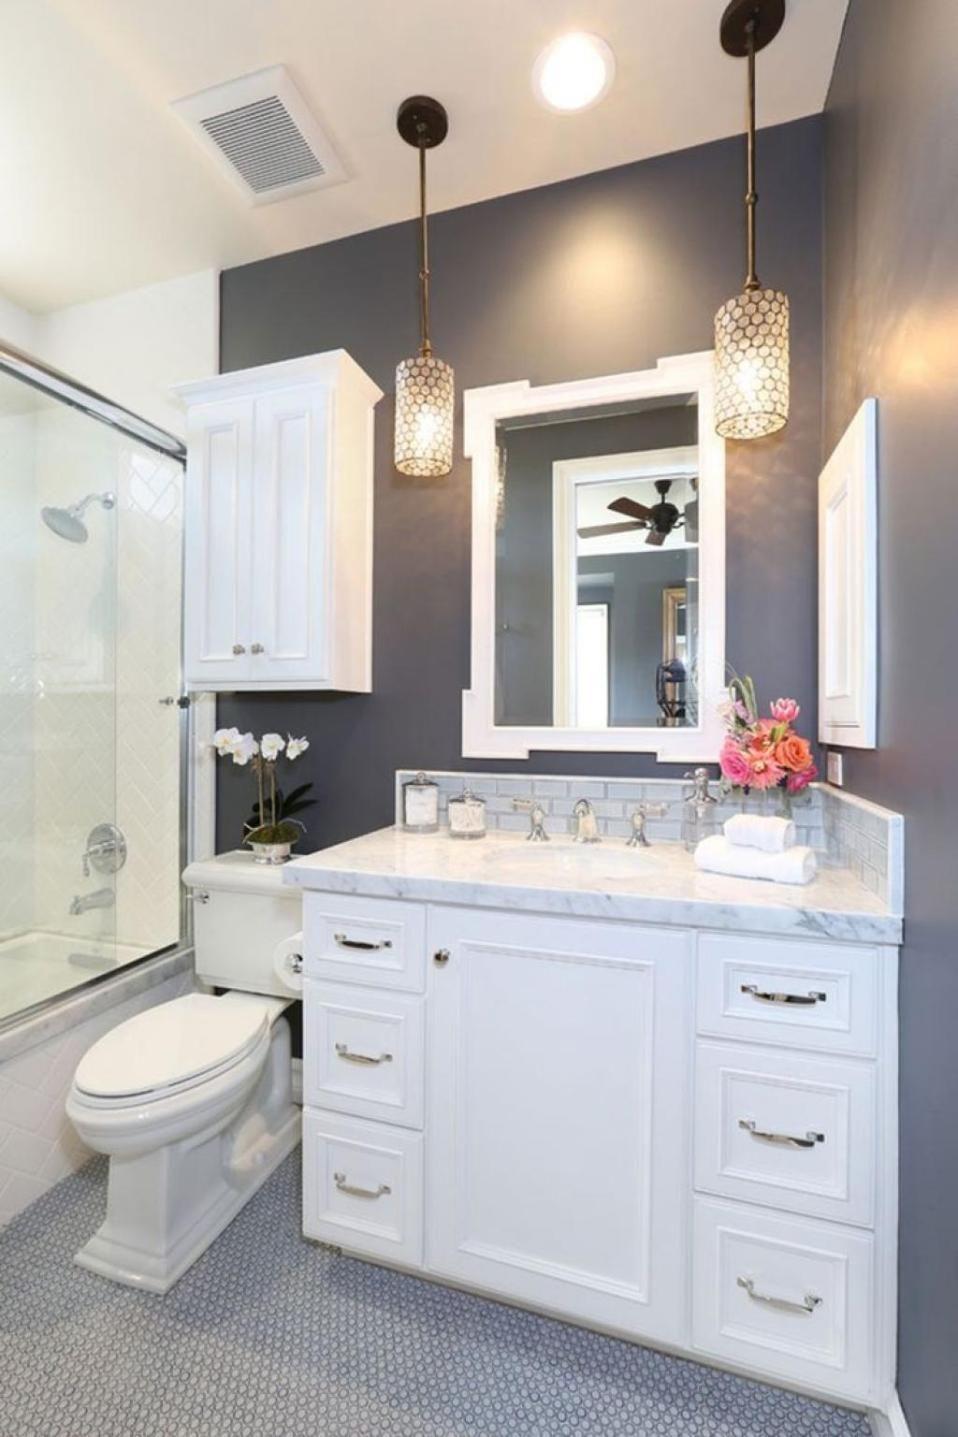 Simple Home and Apartment Interior Design | Beautiful ...